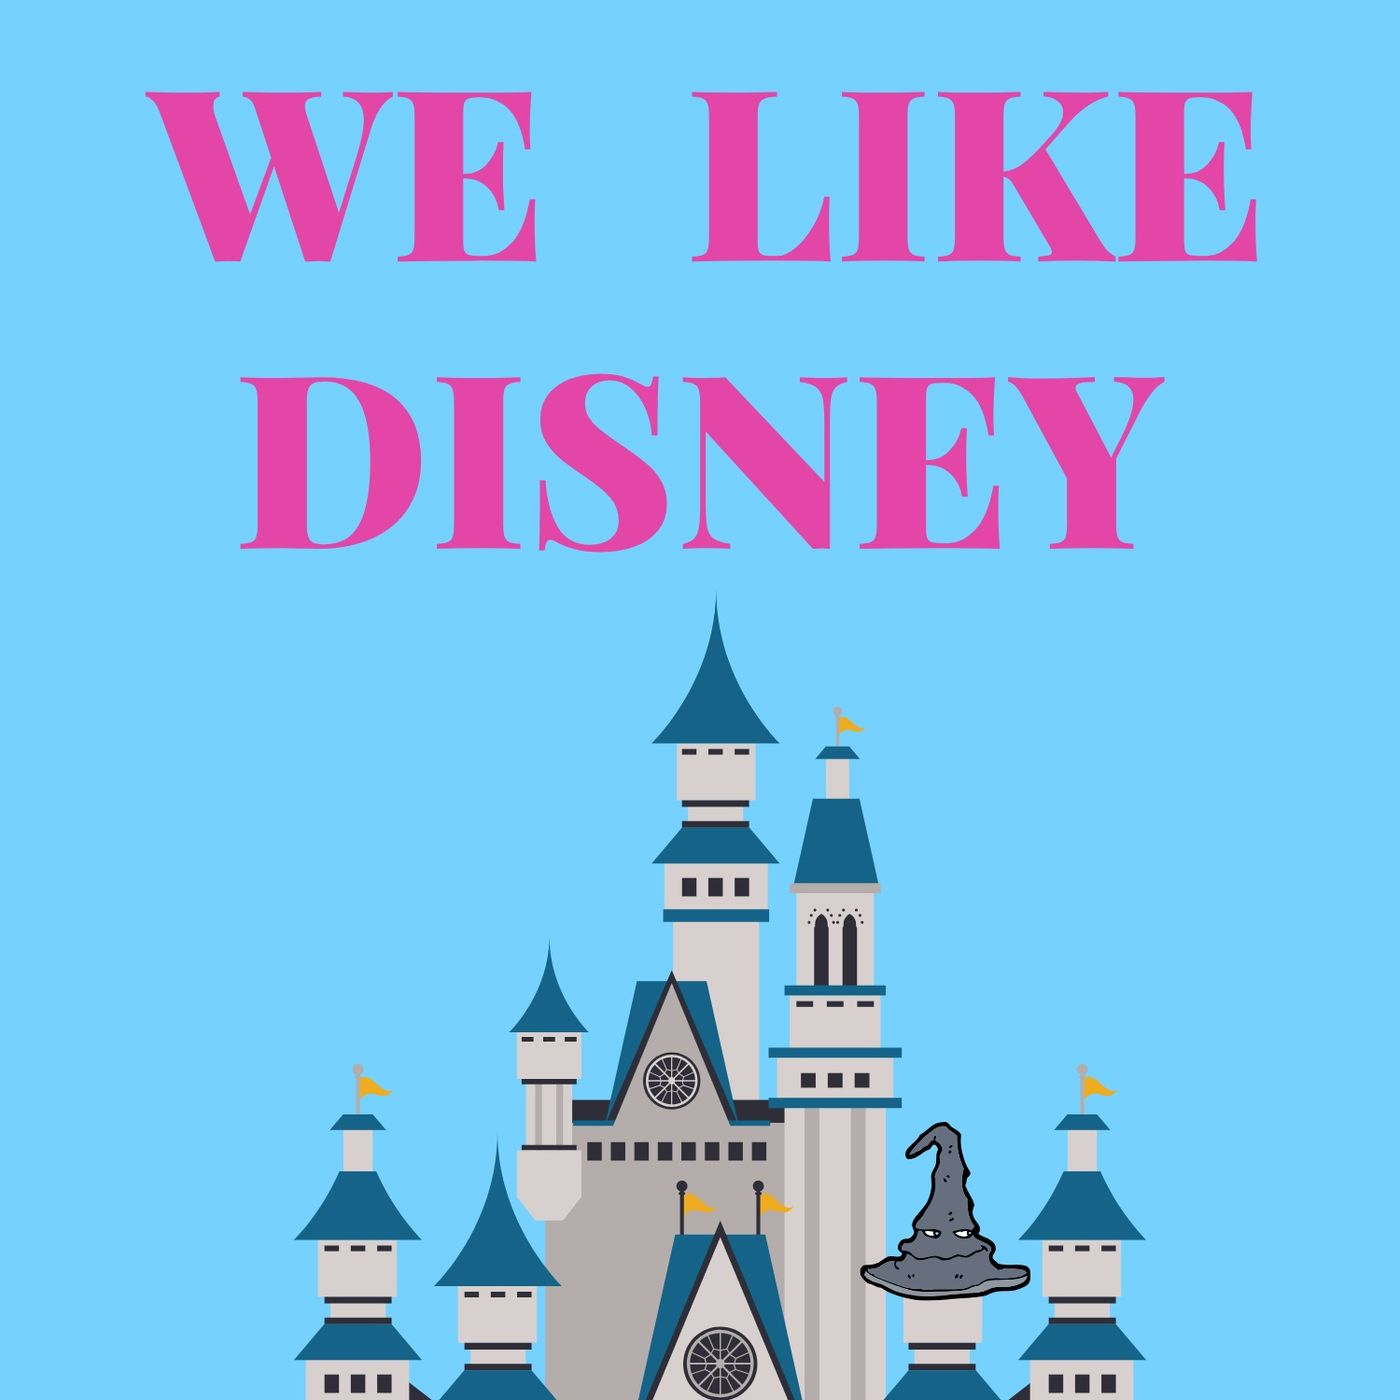 S5 Ep.1: We Like Disney goes to Knott's Berry Farm Part 1